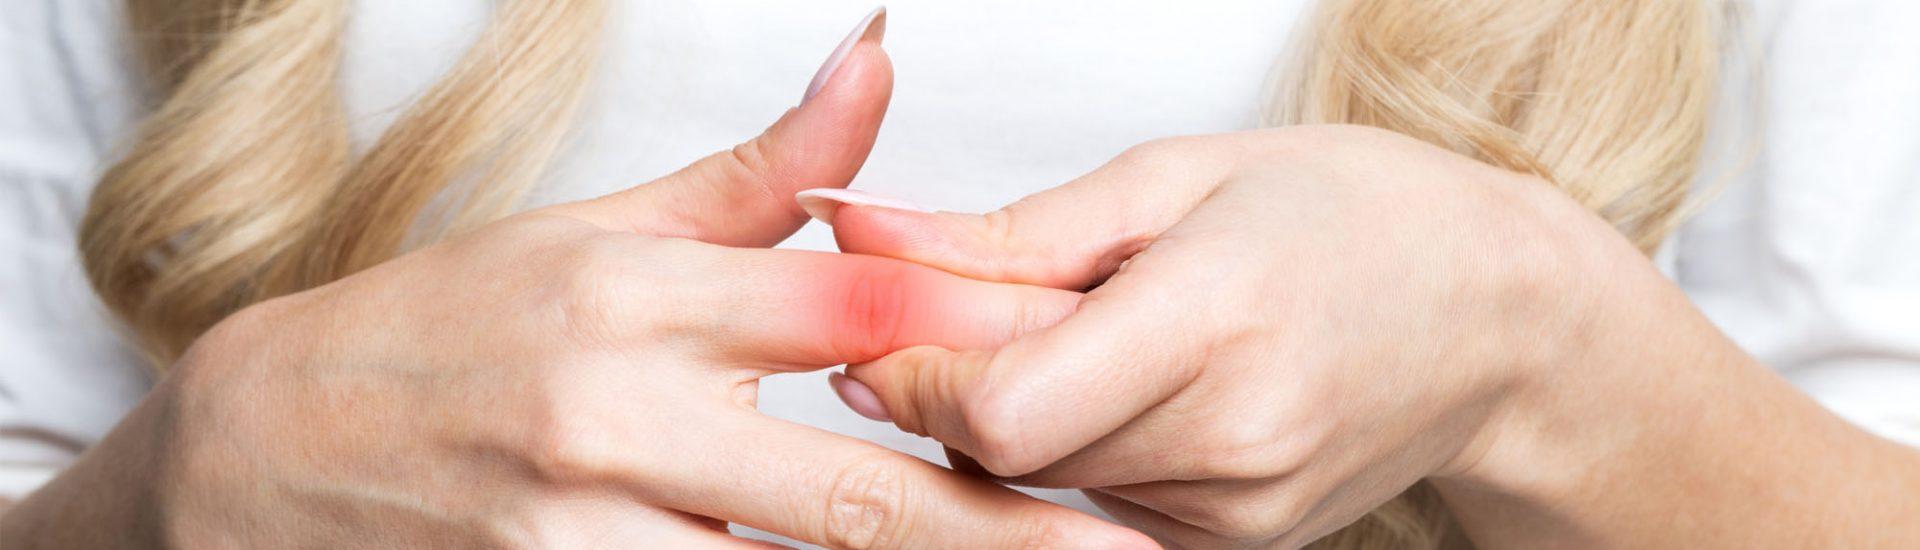 Schmerzen in den Fingergelenken: Symptome, Ursachen, Diagnose & Therapie